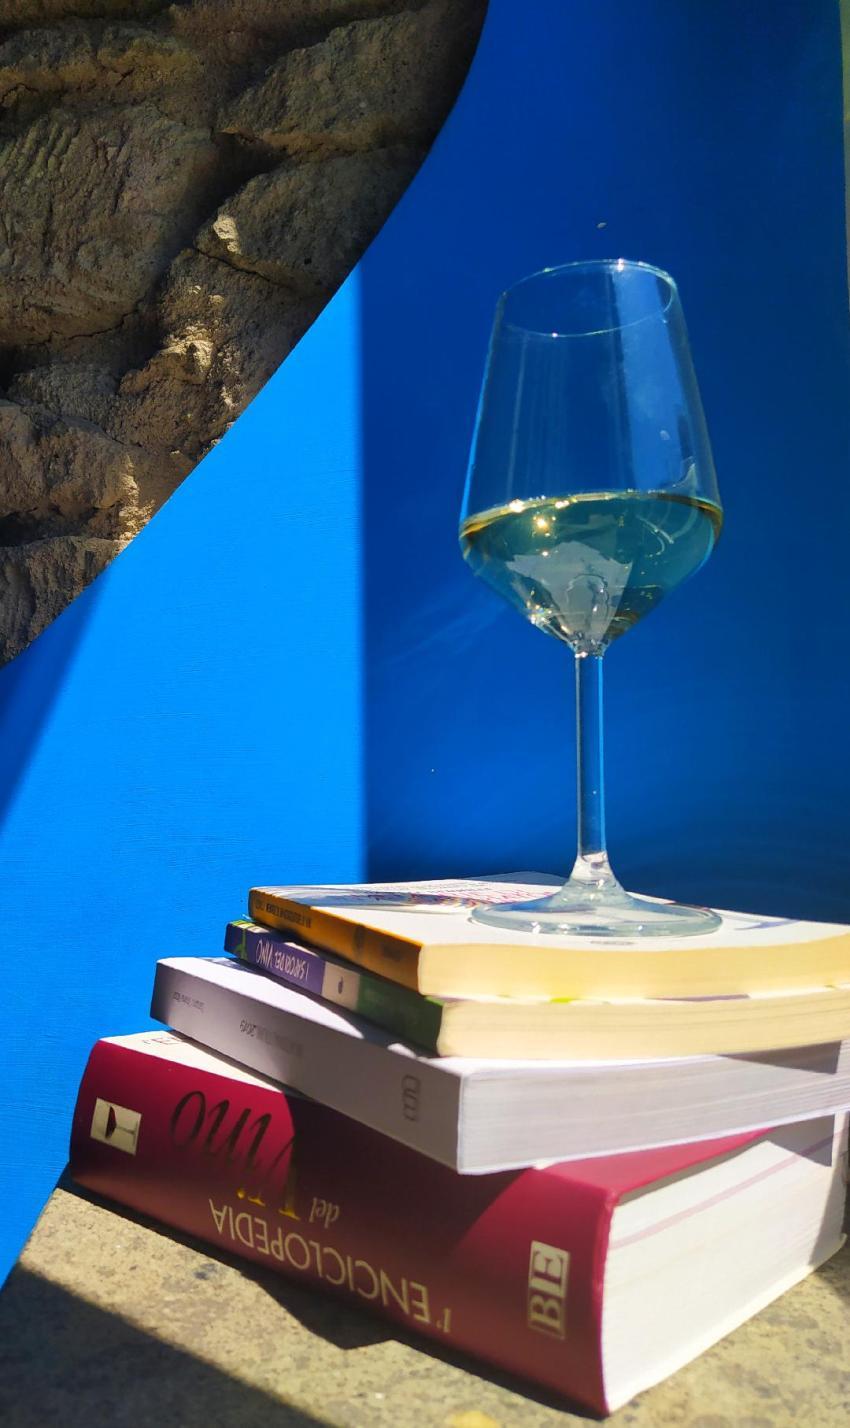 Libri, calice, sommelier